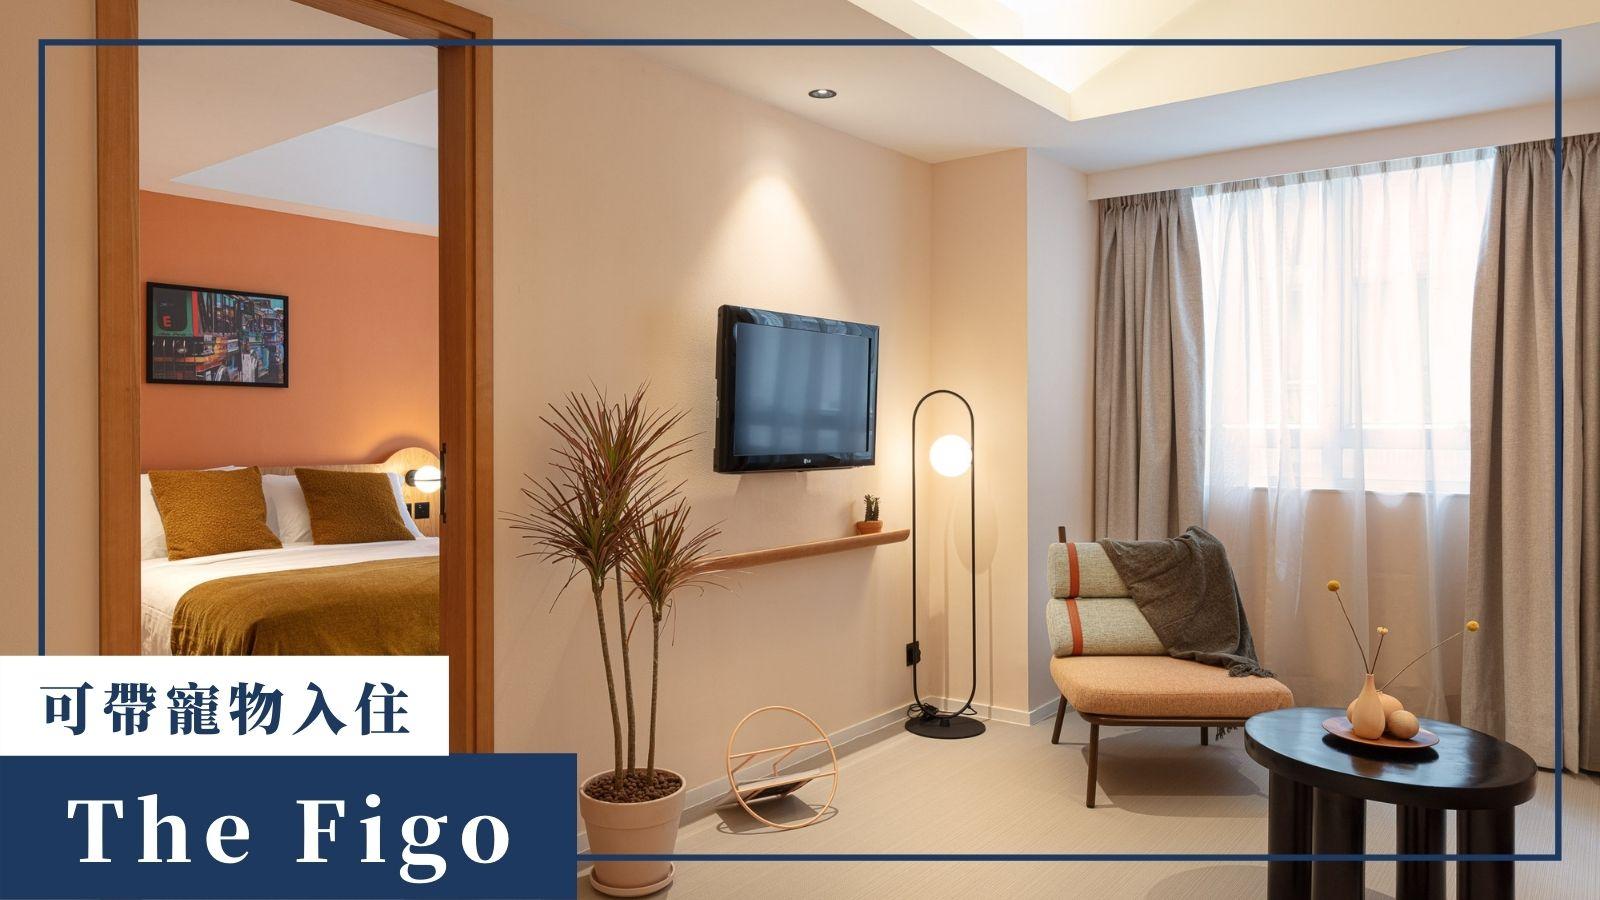 可養寵物服務式住宅-The Figo